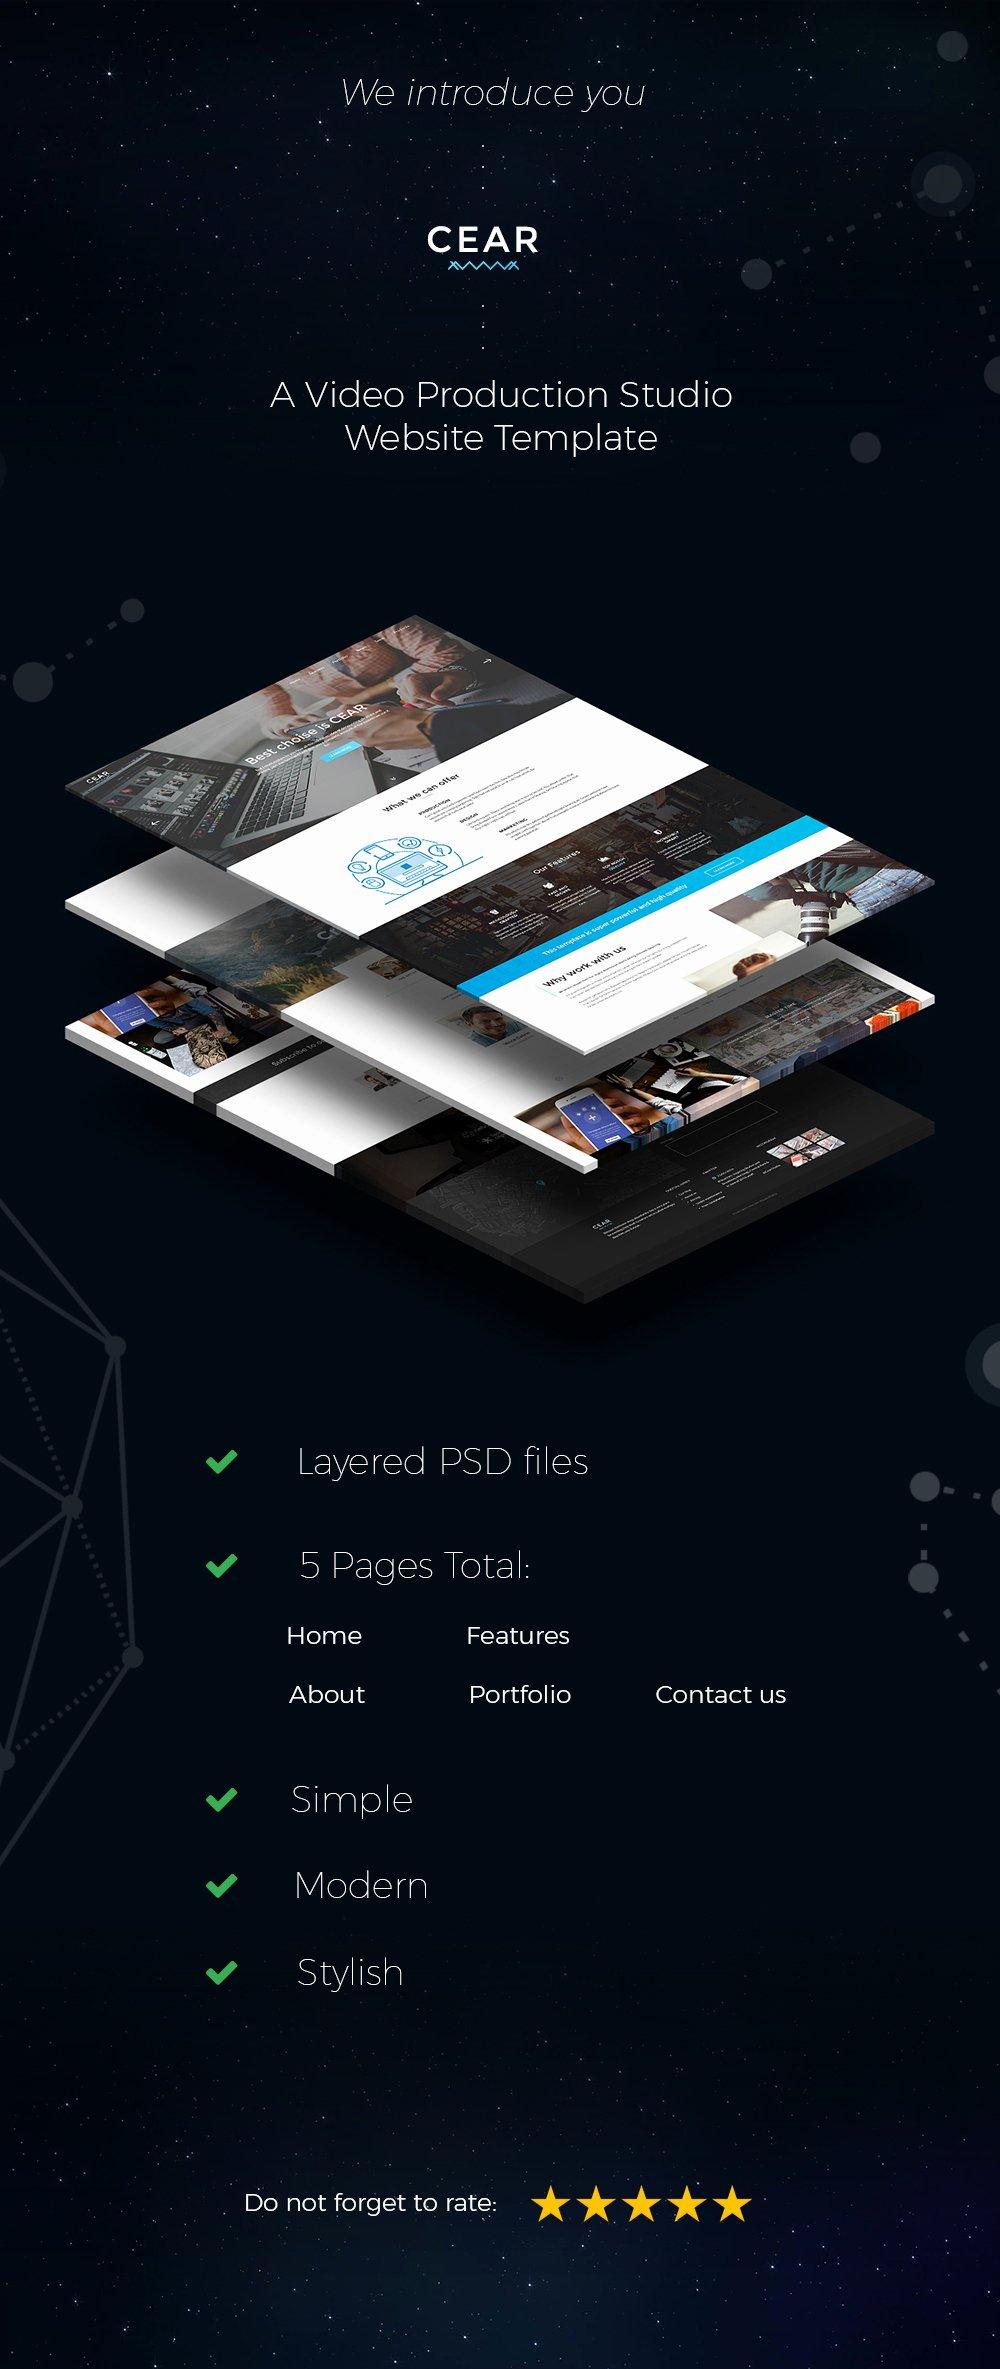 Video Production Web Template Elegant Cear Video Production Website Psd Template by Quietlab